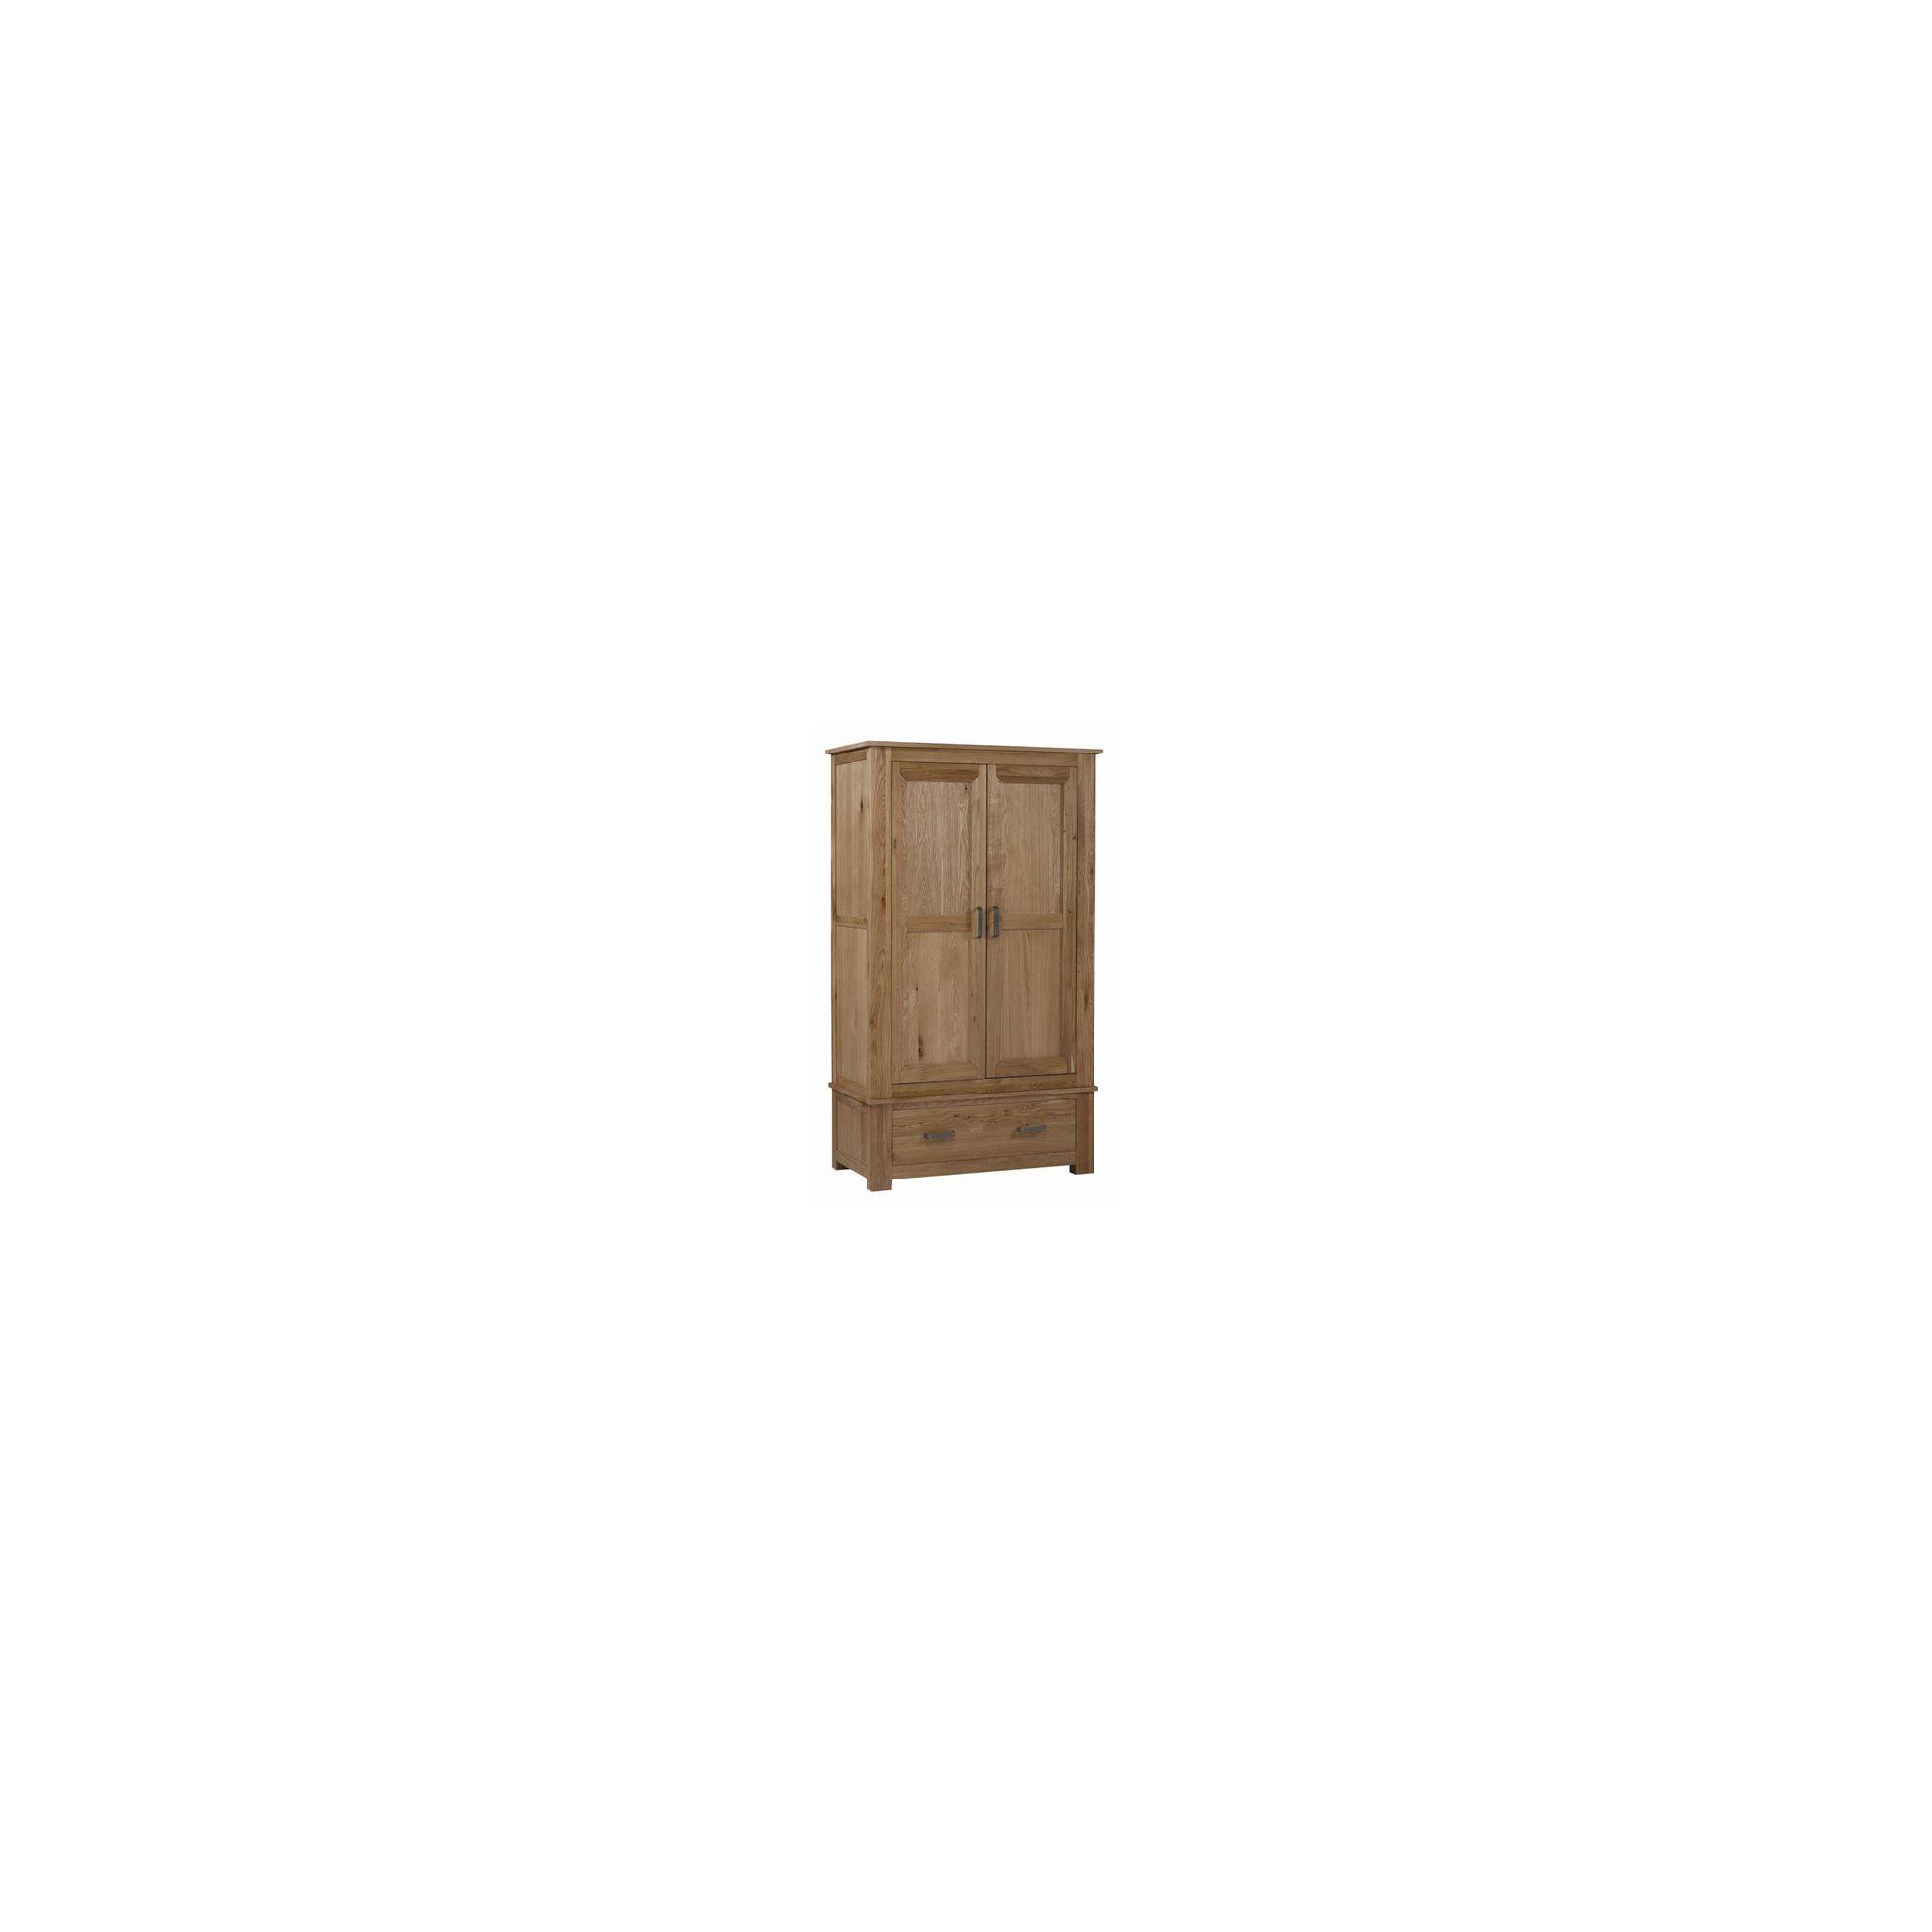 Kelburn Furniture Lyon Gents Wardrobe in Light Oak Matt Lacquer at Tesco Direct